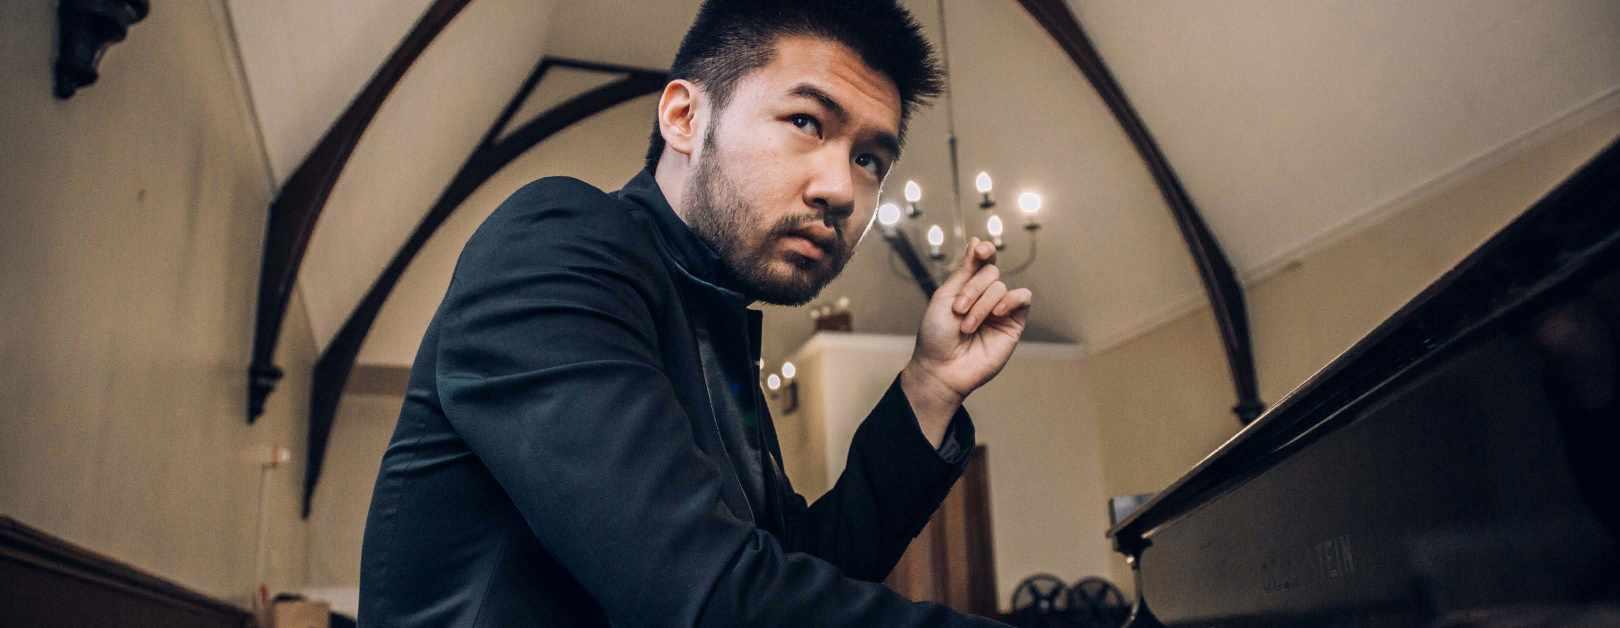 Bravo! Vail: Beethoven's Piano Concerto No. 2 Featuring Conrad Tao